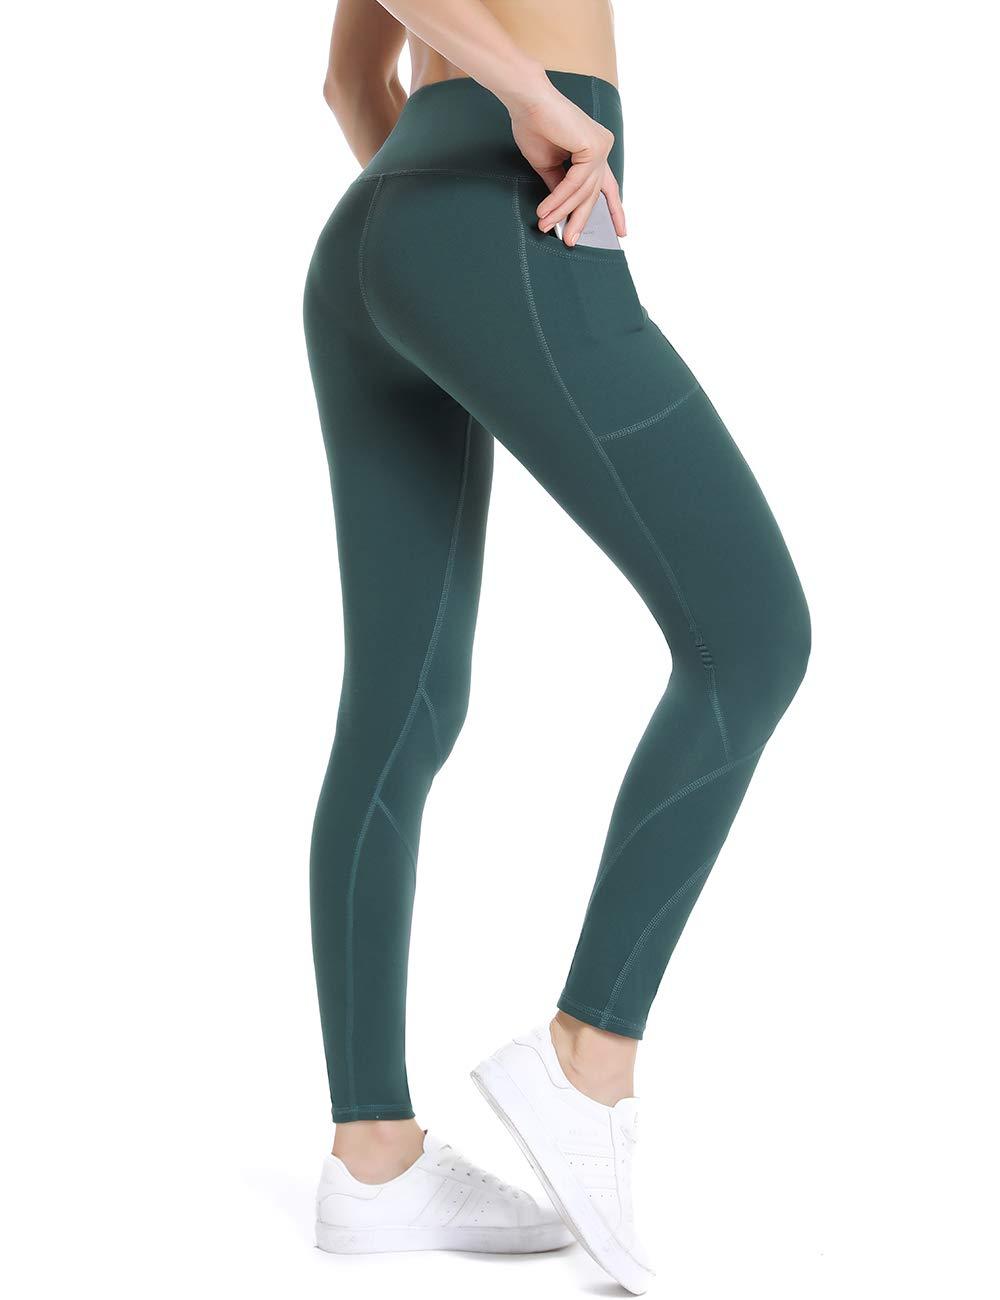 c6dffd98d8361e ALONG FIT Sport Leggings mit Taschen Damen Sporthose Yogahose Fitnesshose  Yoga Leggings für Damen product image